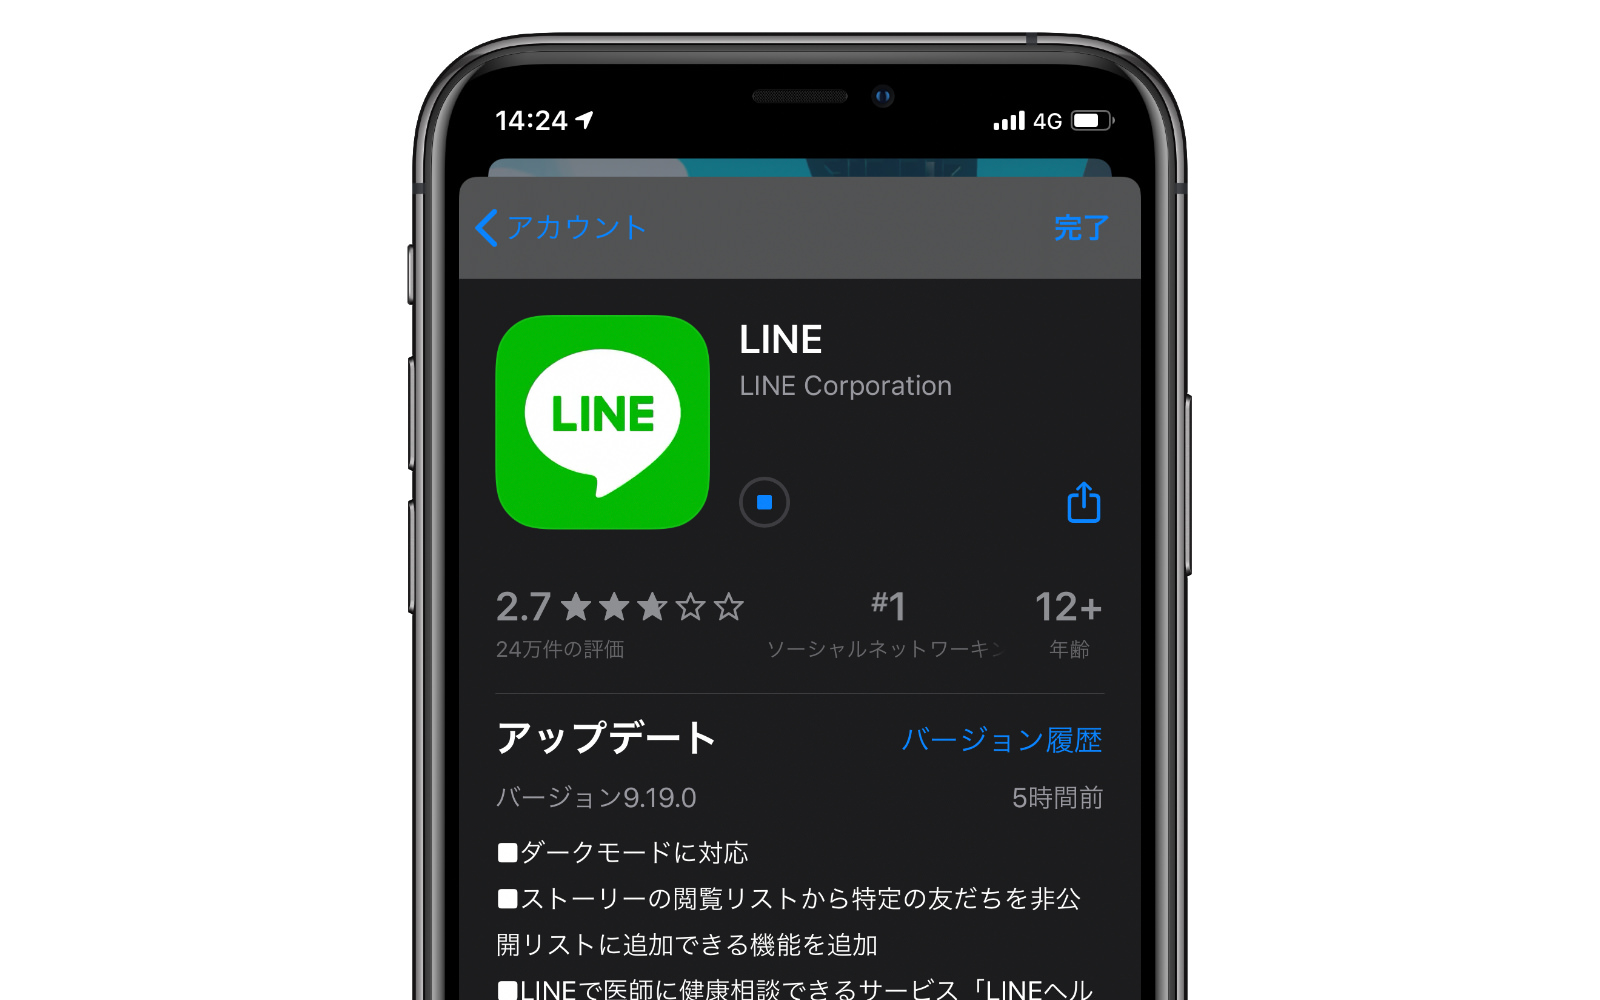 Line ダーク モード